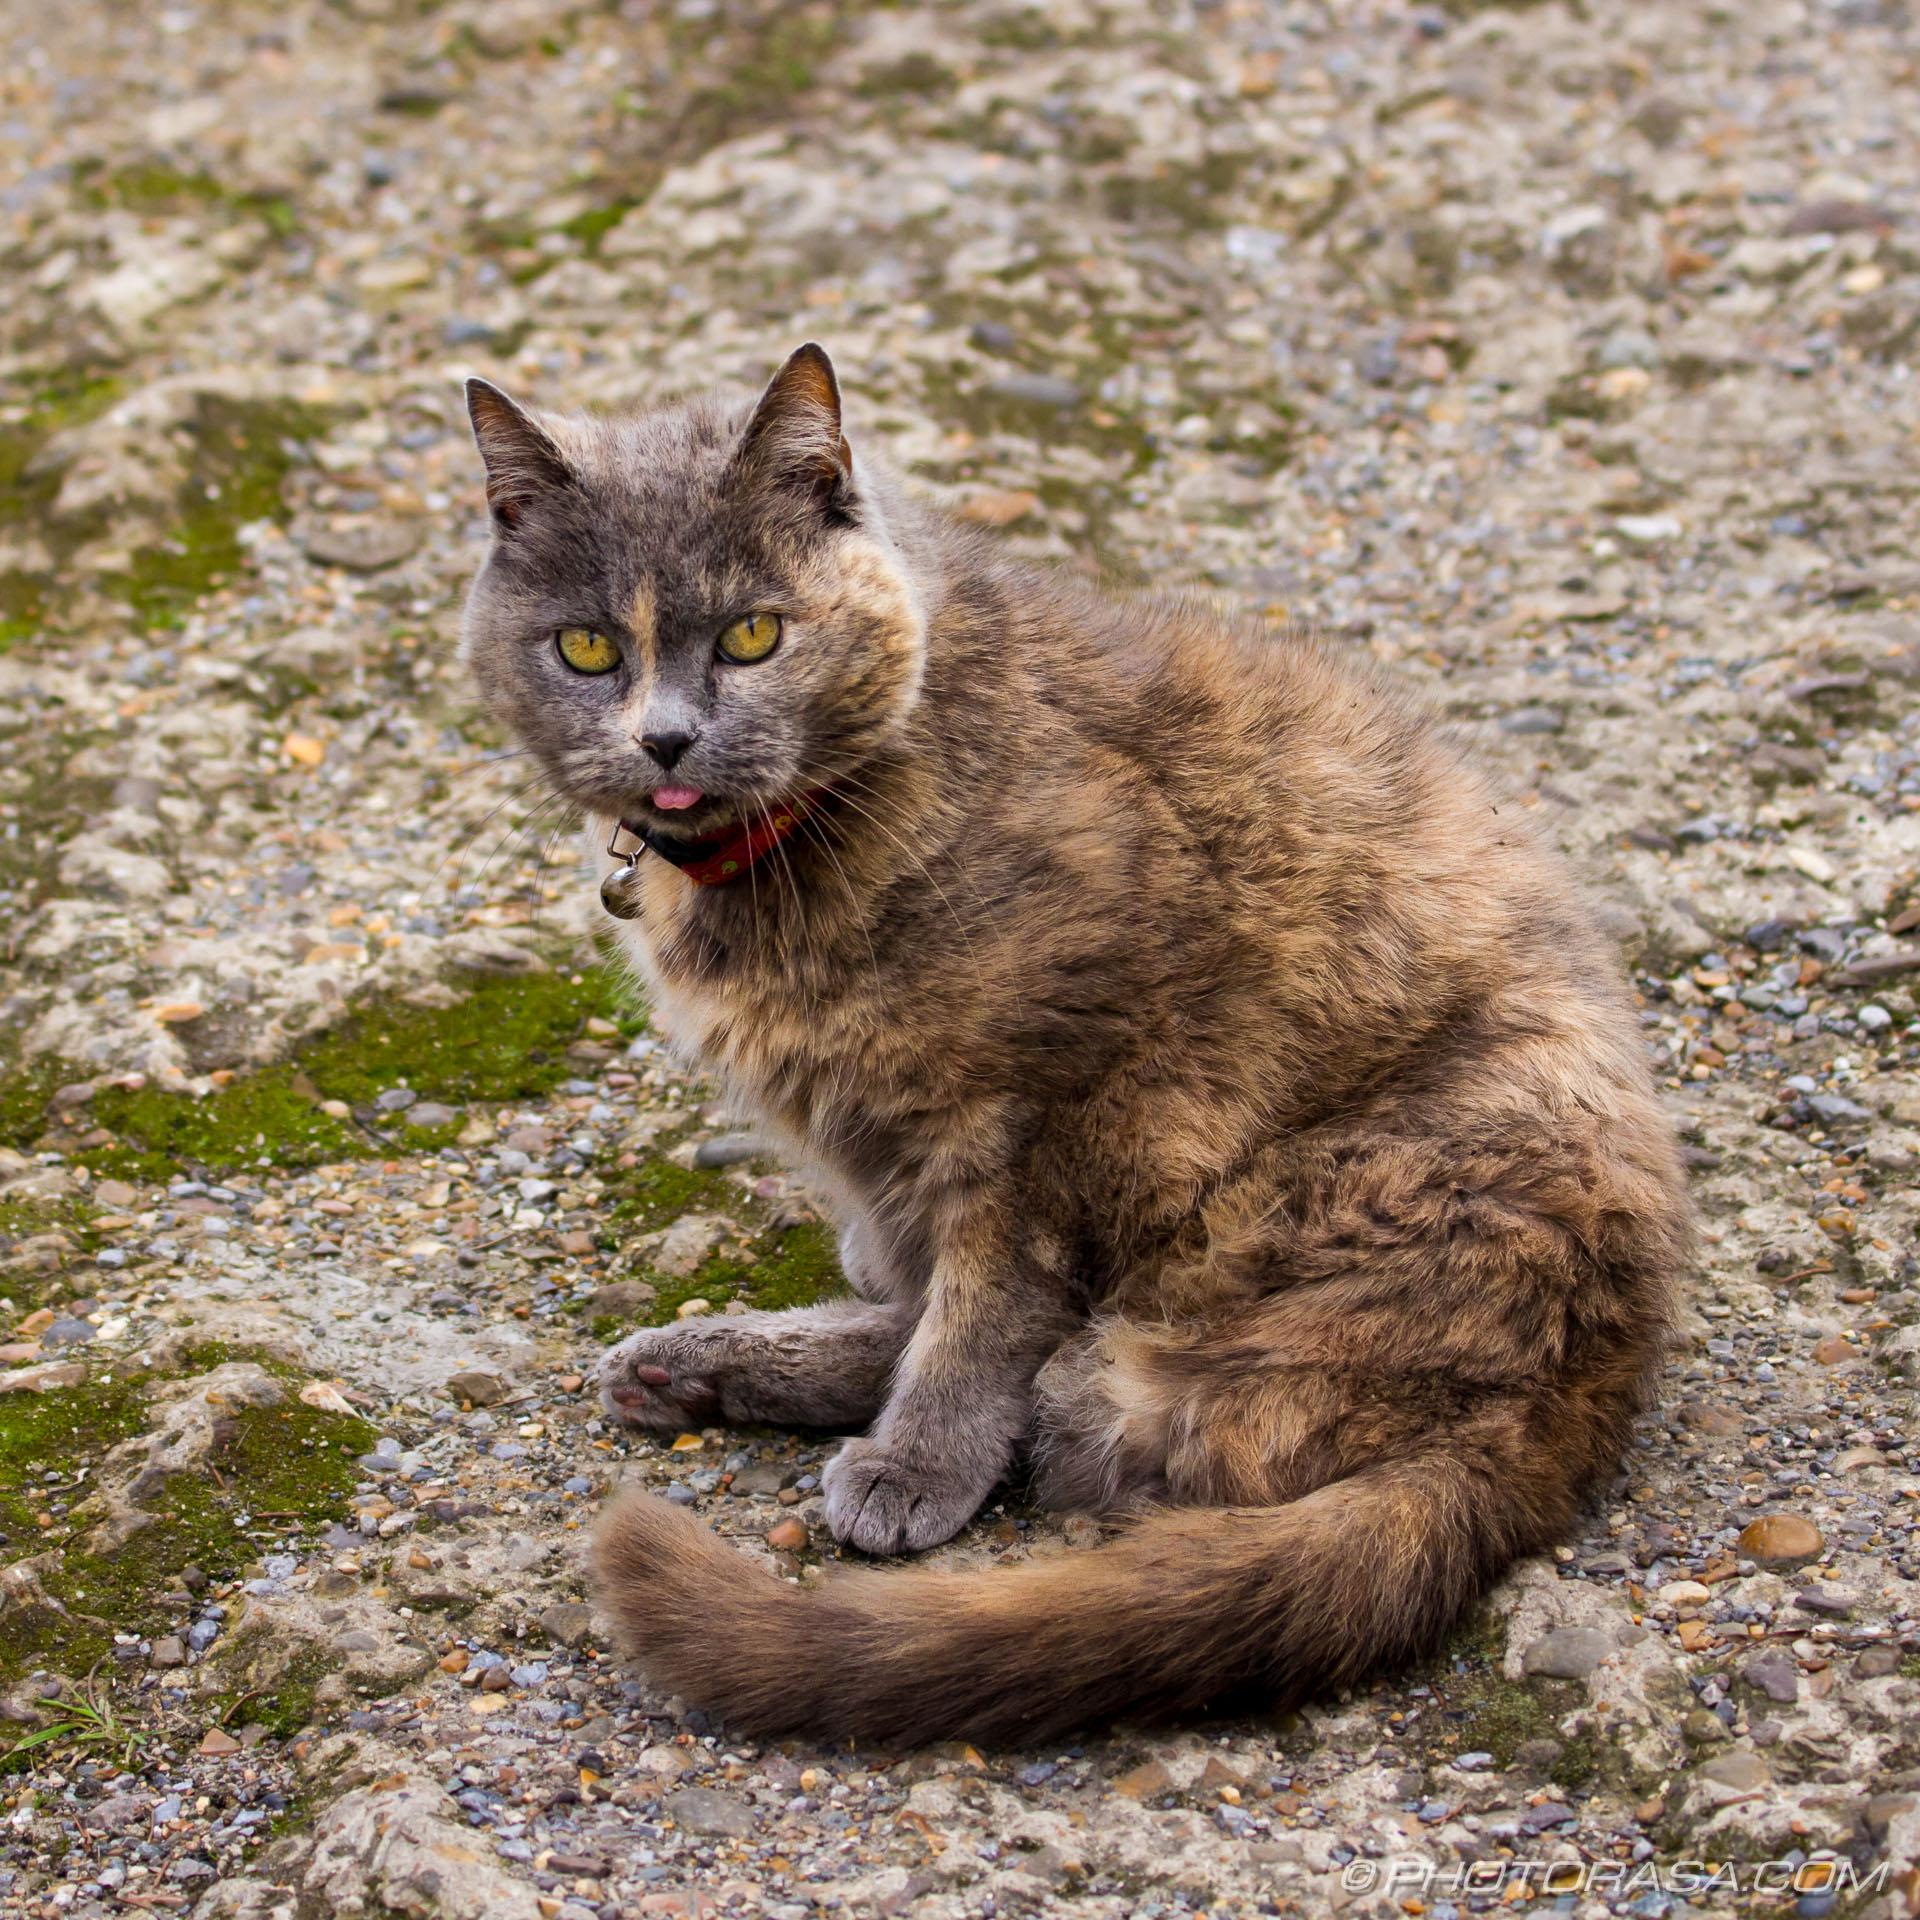 http://photorasa.com/grey-ginger-moggy/grey-ginger-cat-3/